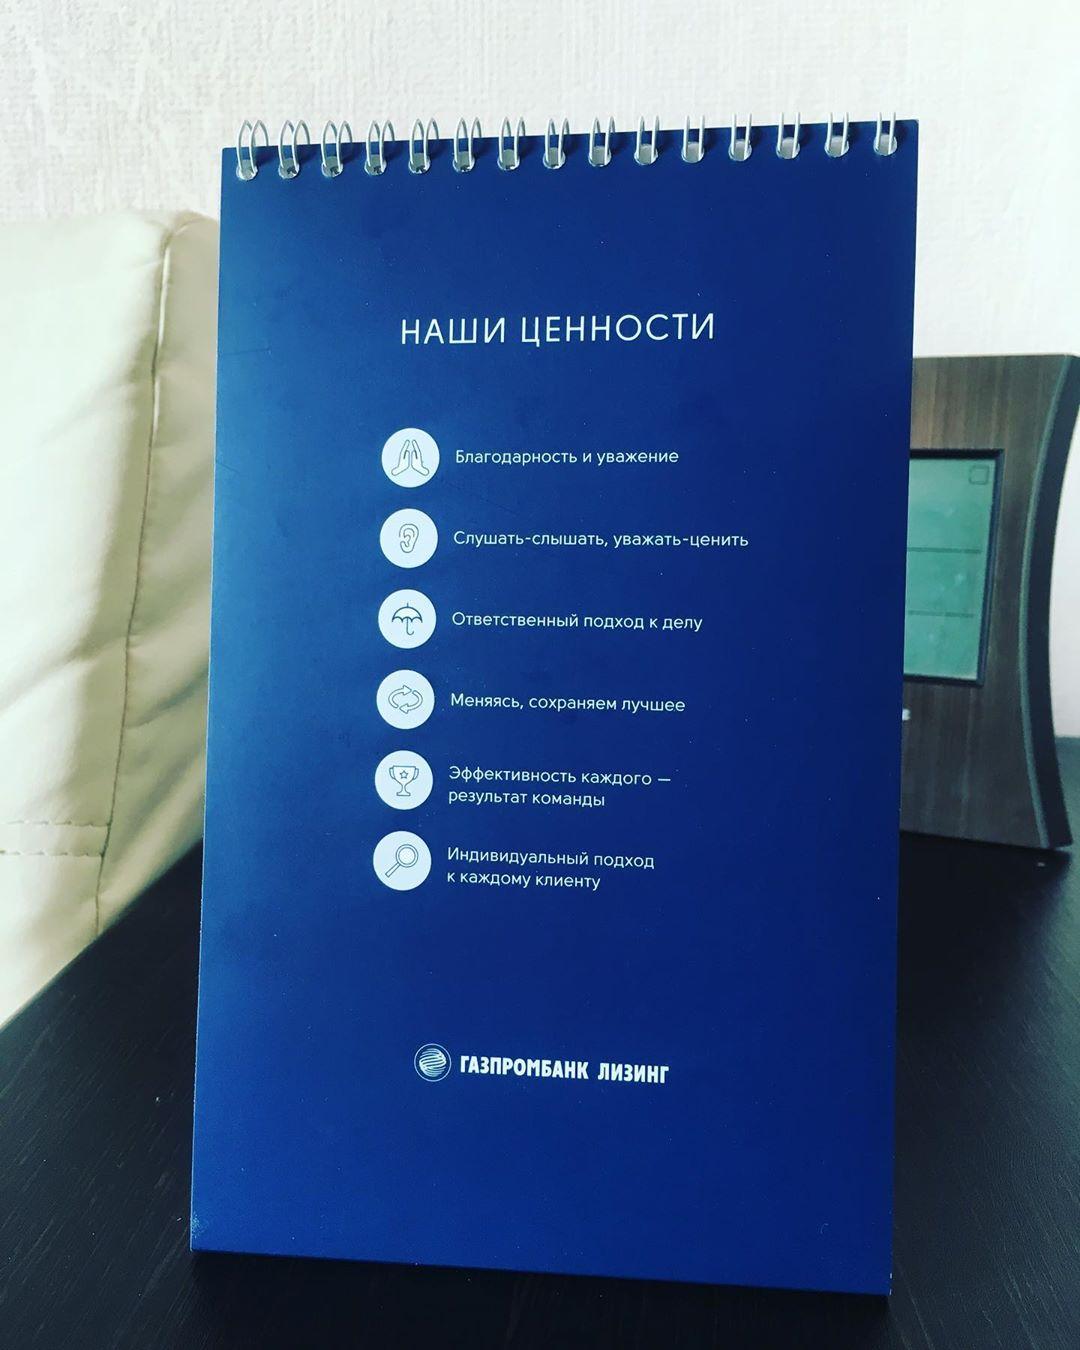 Дизайн календаря 2020